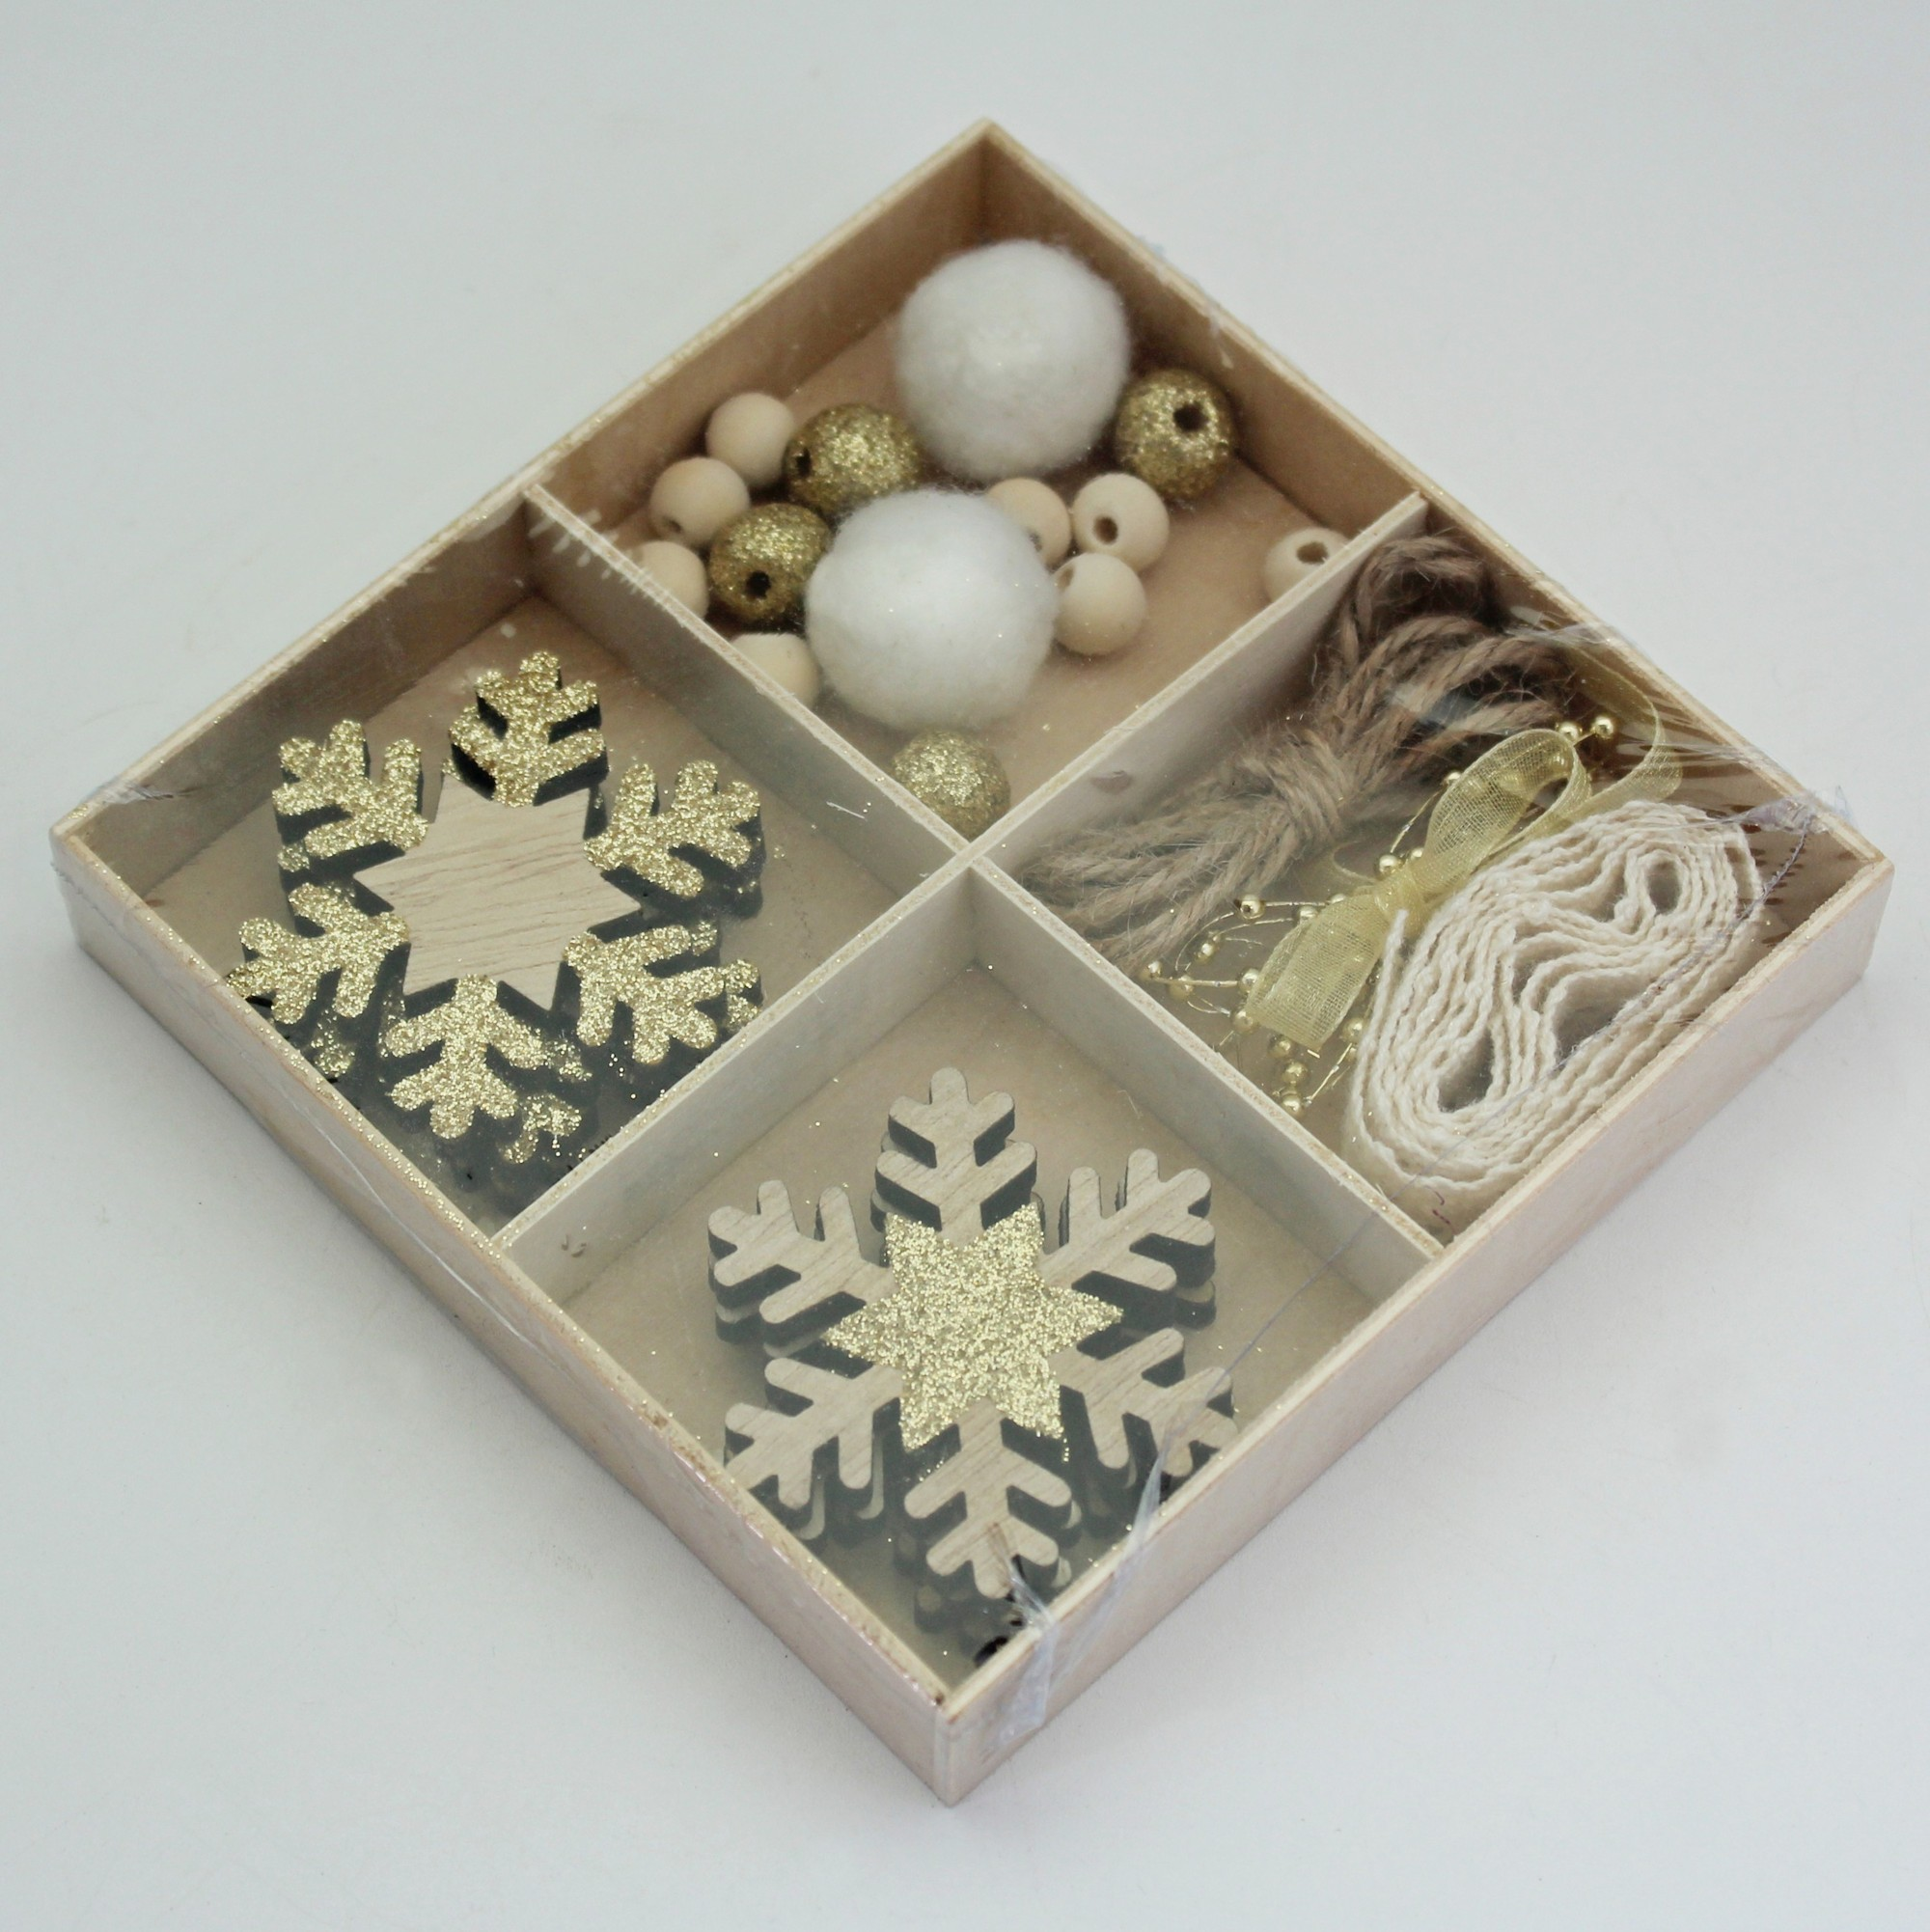 Sada DIY vánoce dřevo